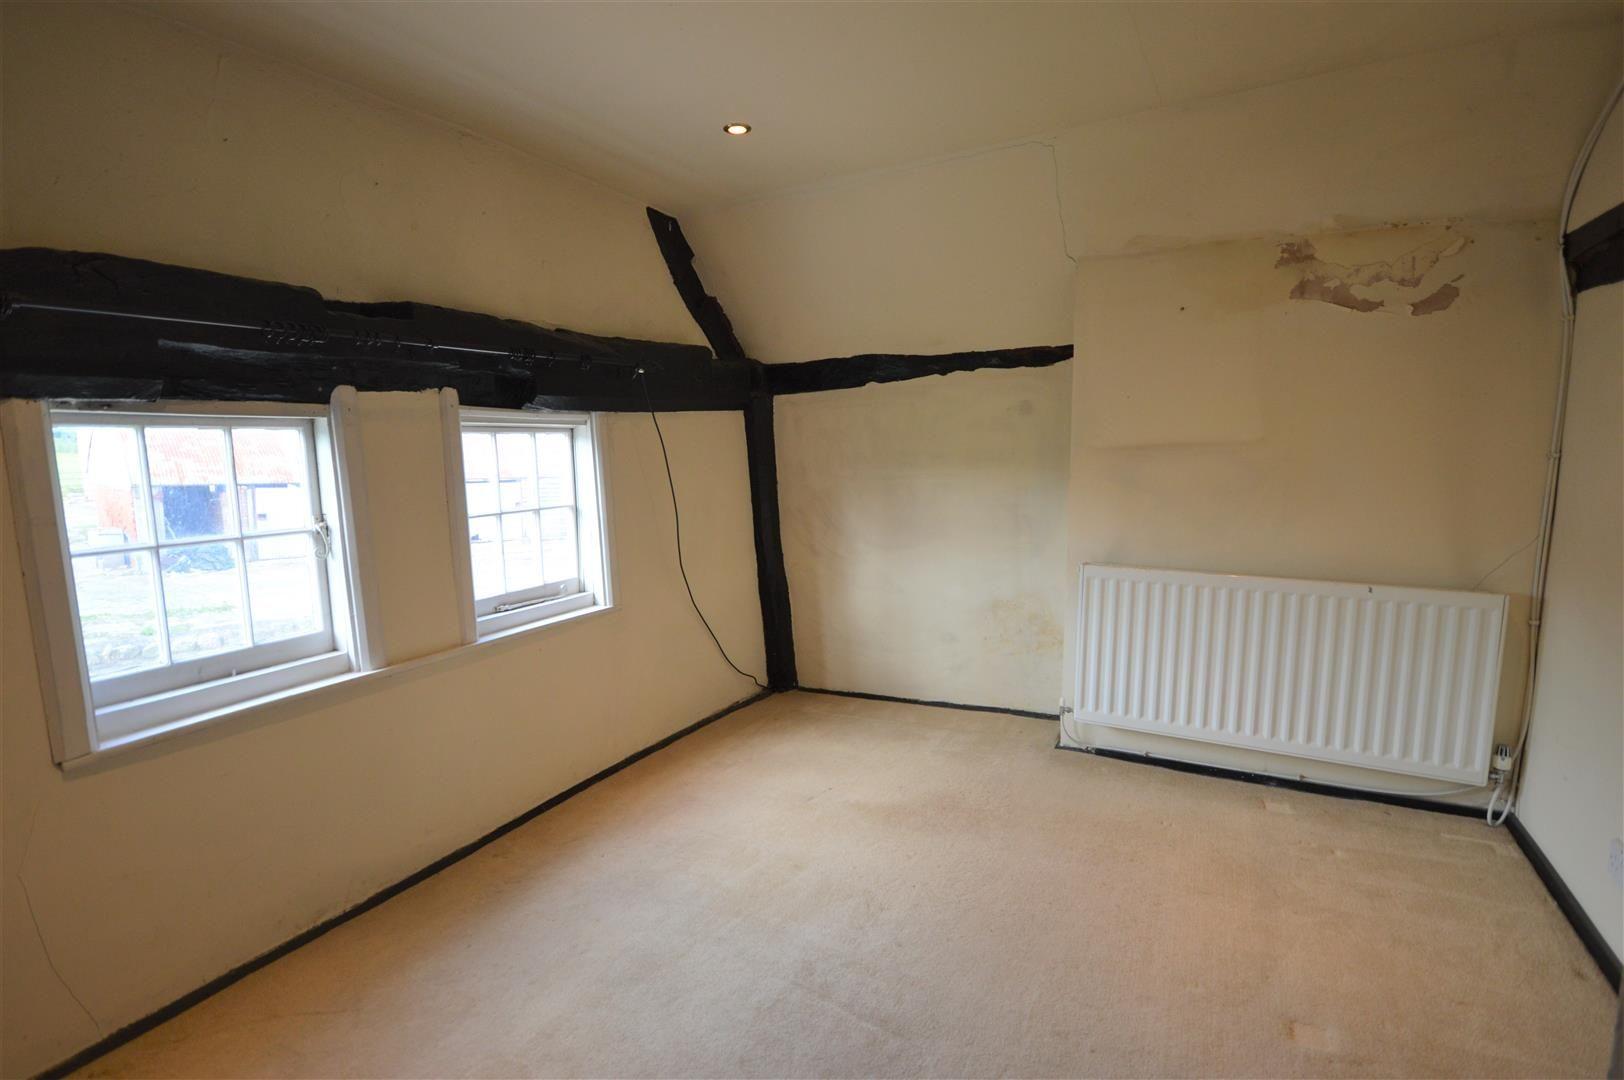 3 bed cottage for sale in Pembridge  - Property Image 9